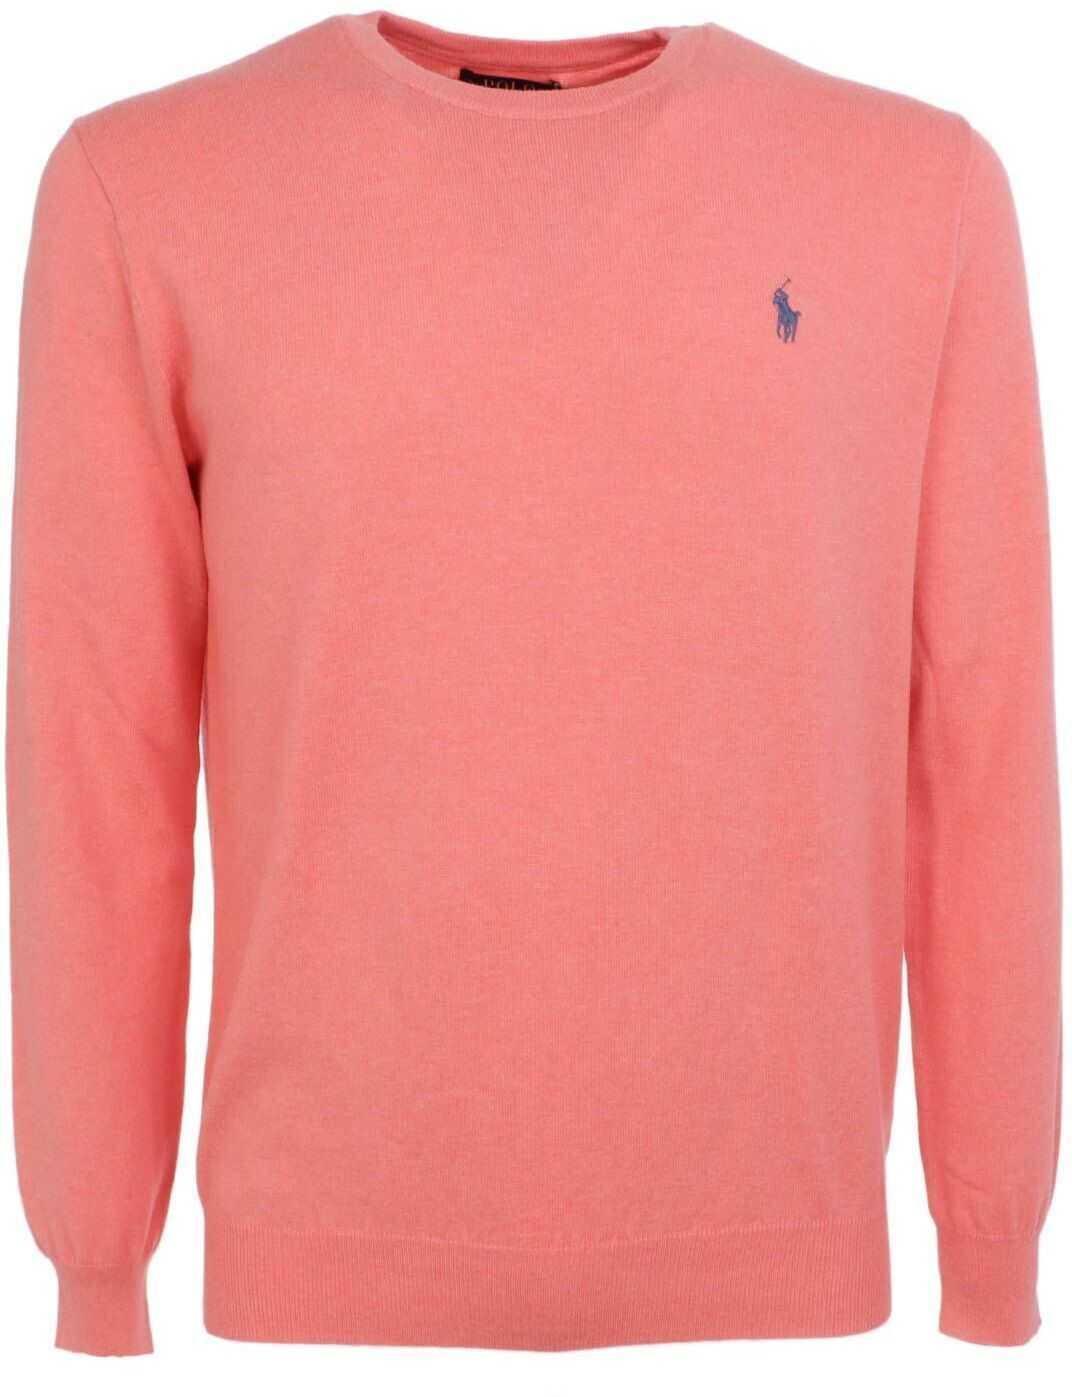 Ralph Lauren Cotton Sweater PINK